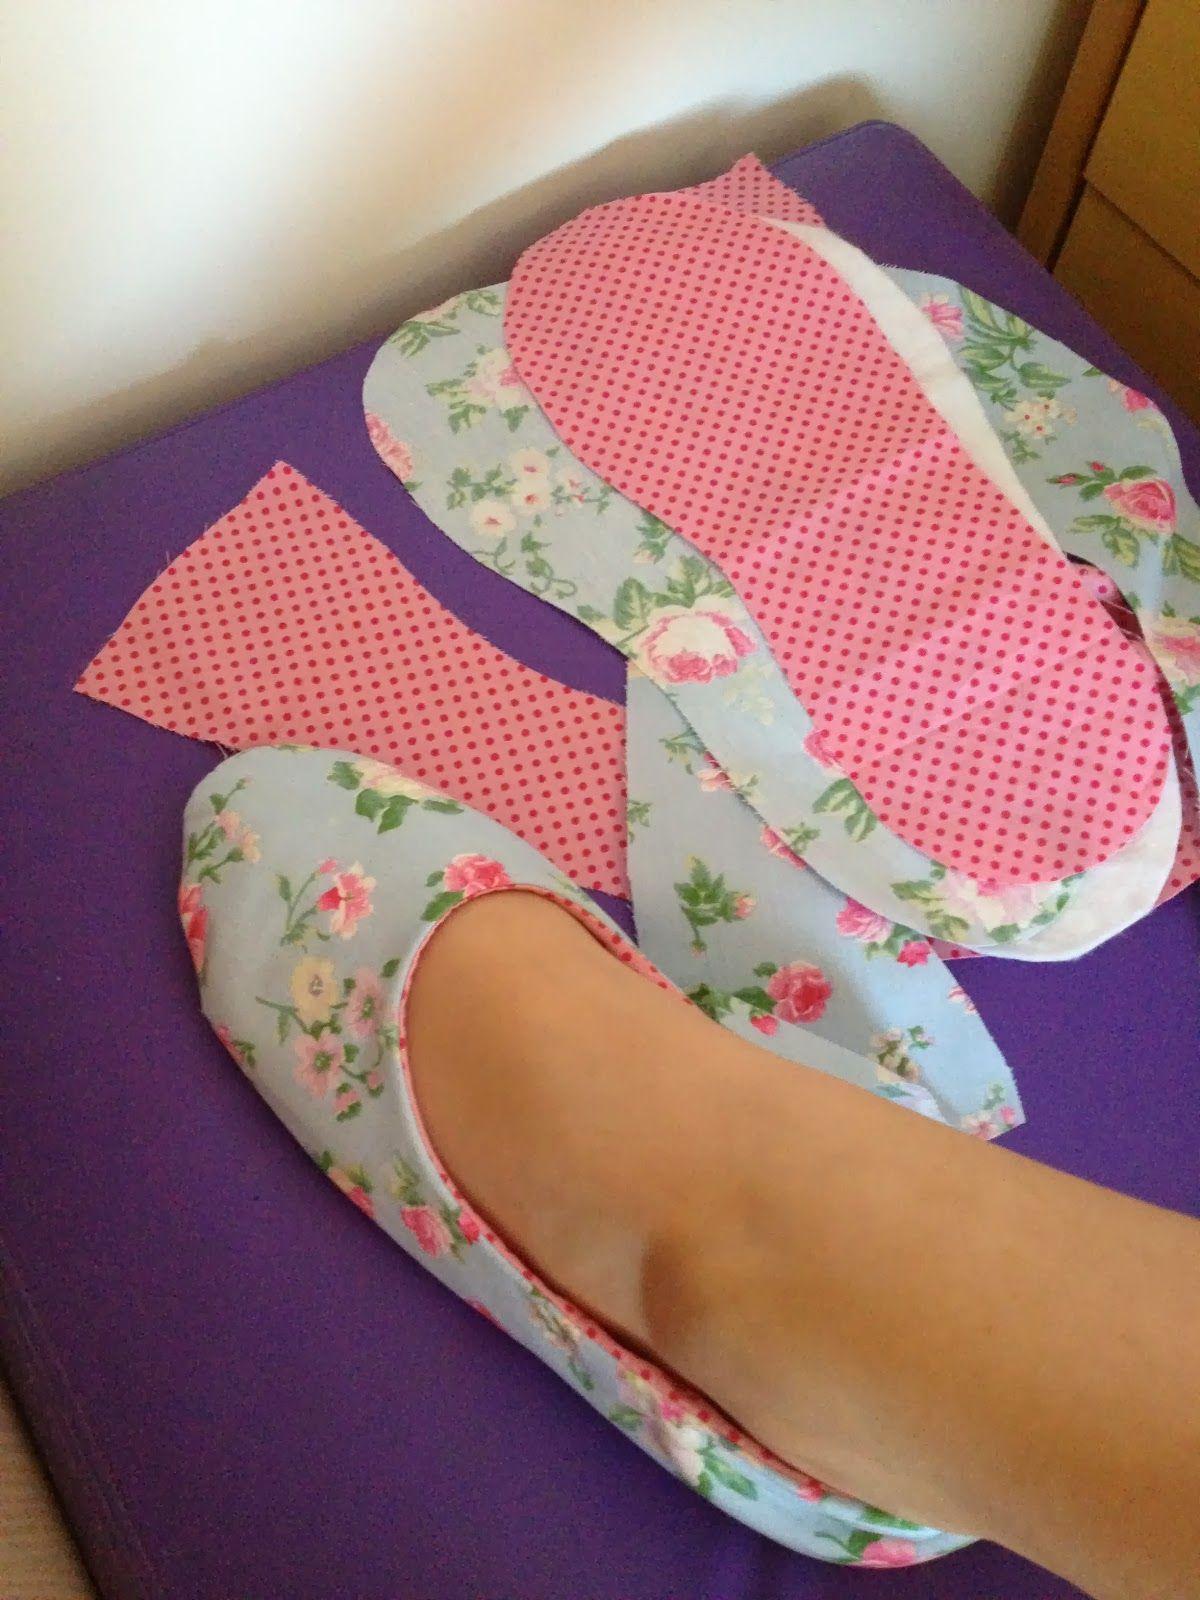 molde sapato | Desenhos de sapatos, Sapatos pintados